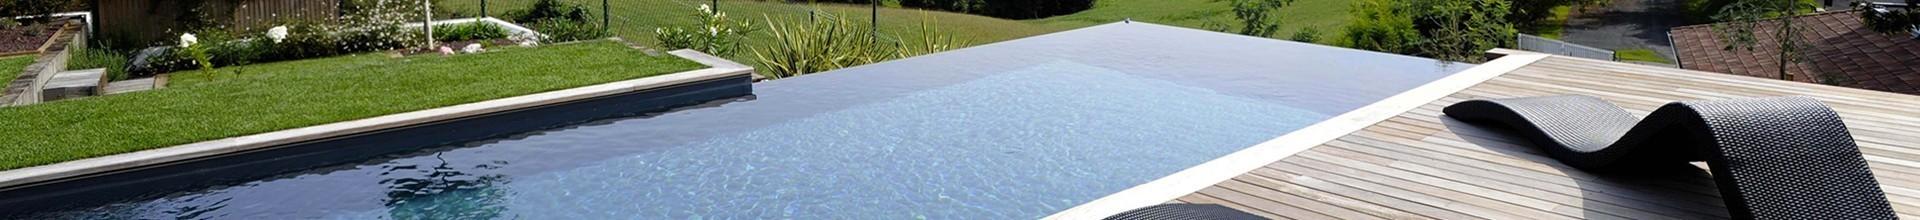 Constructeur piscine discount Grand Est